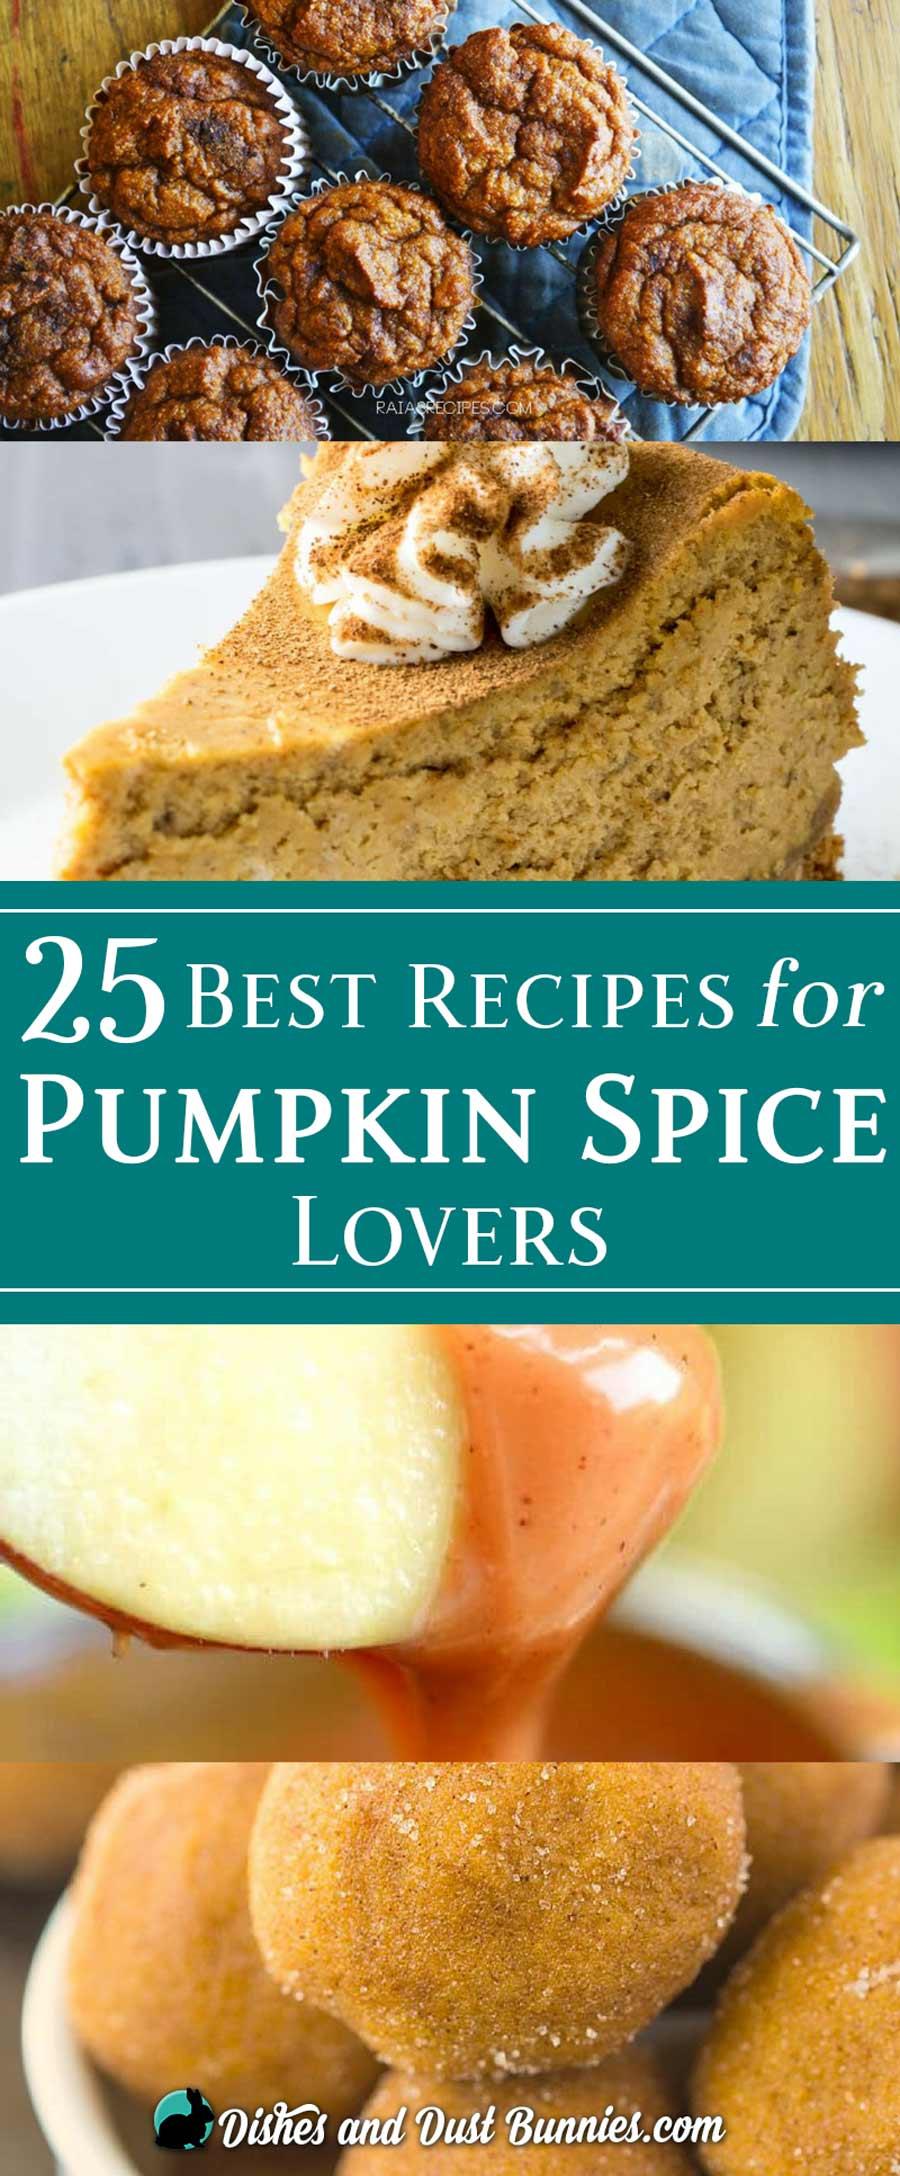 25 Best Recipes for Pumpkin Spice Lovers - dishesanddustbunnies.com